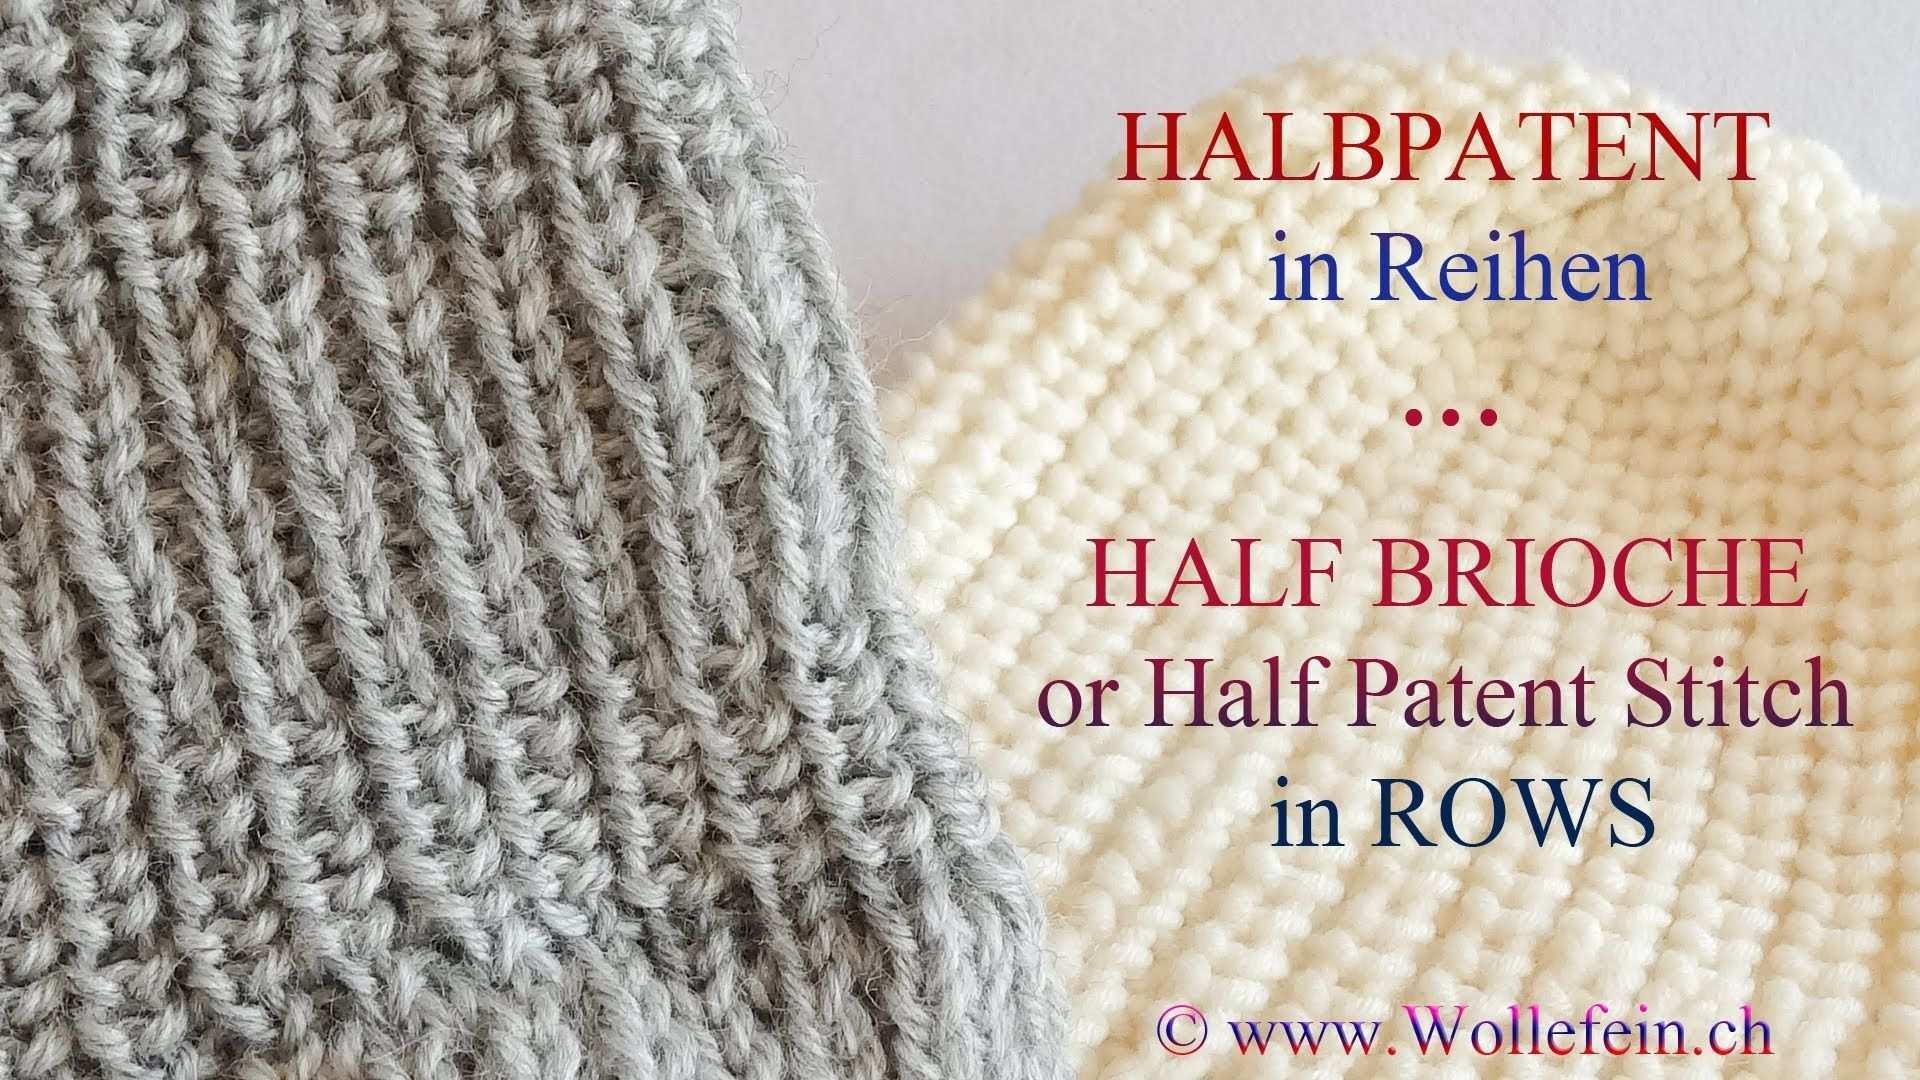 Halbpatent In Reihen Half Patent Or Half Brioche Stitch In Rows Crochet Cable Baby Blanket Crochet Pattern Crochet Throw Pattern